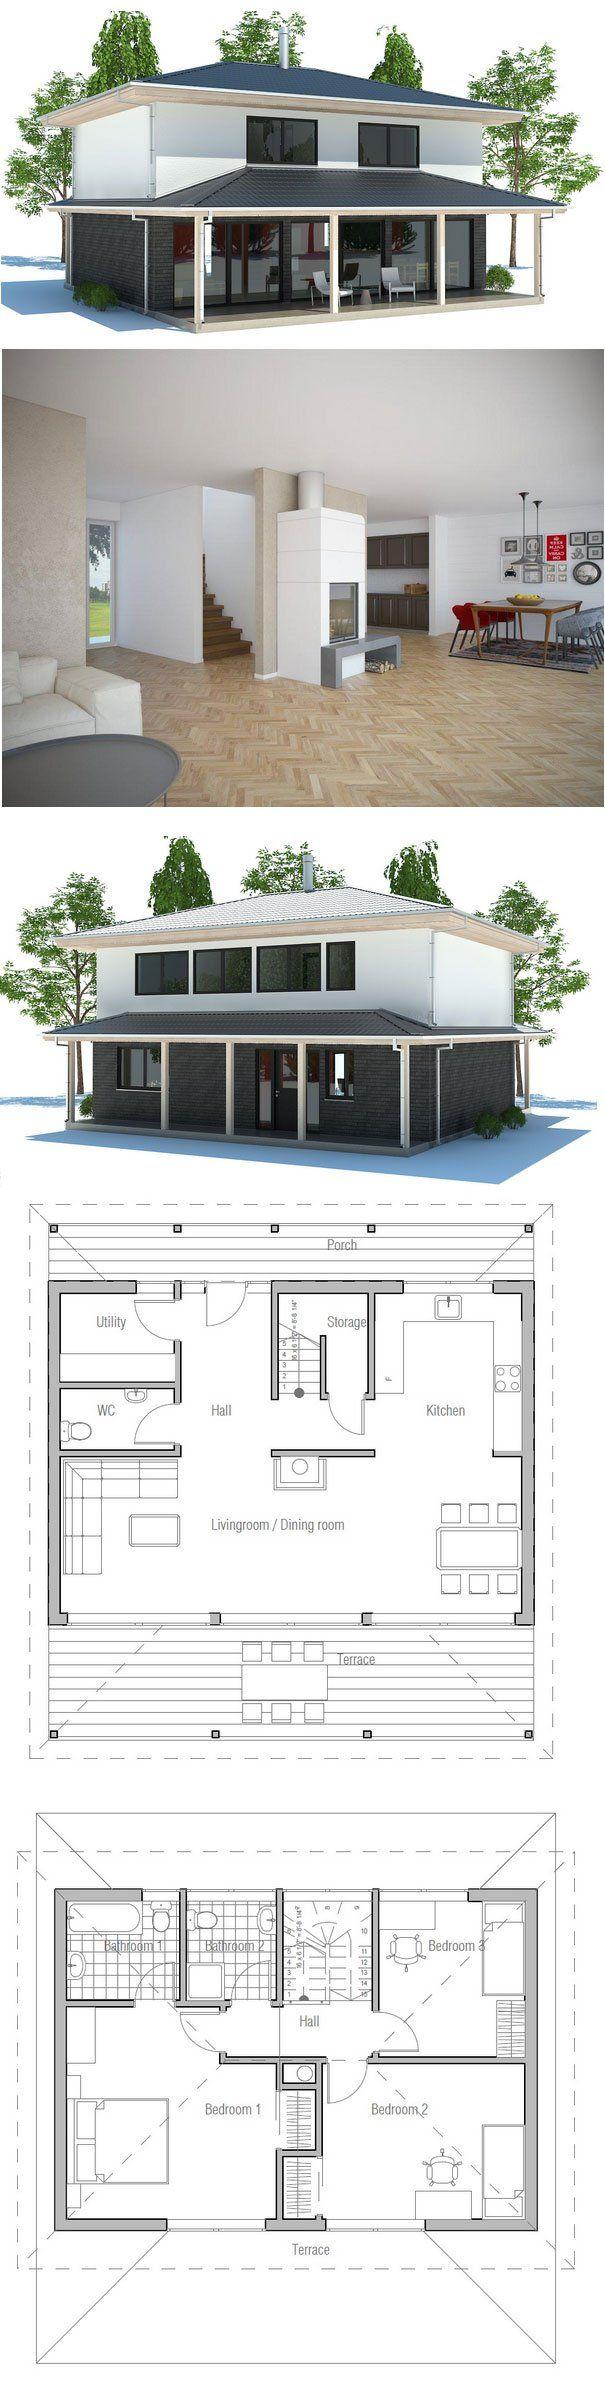 88 best Affordable Homes images on Pinterest | Arquitetura, Floor ...